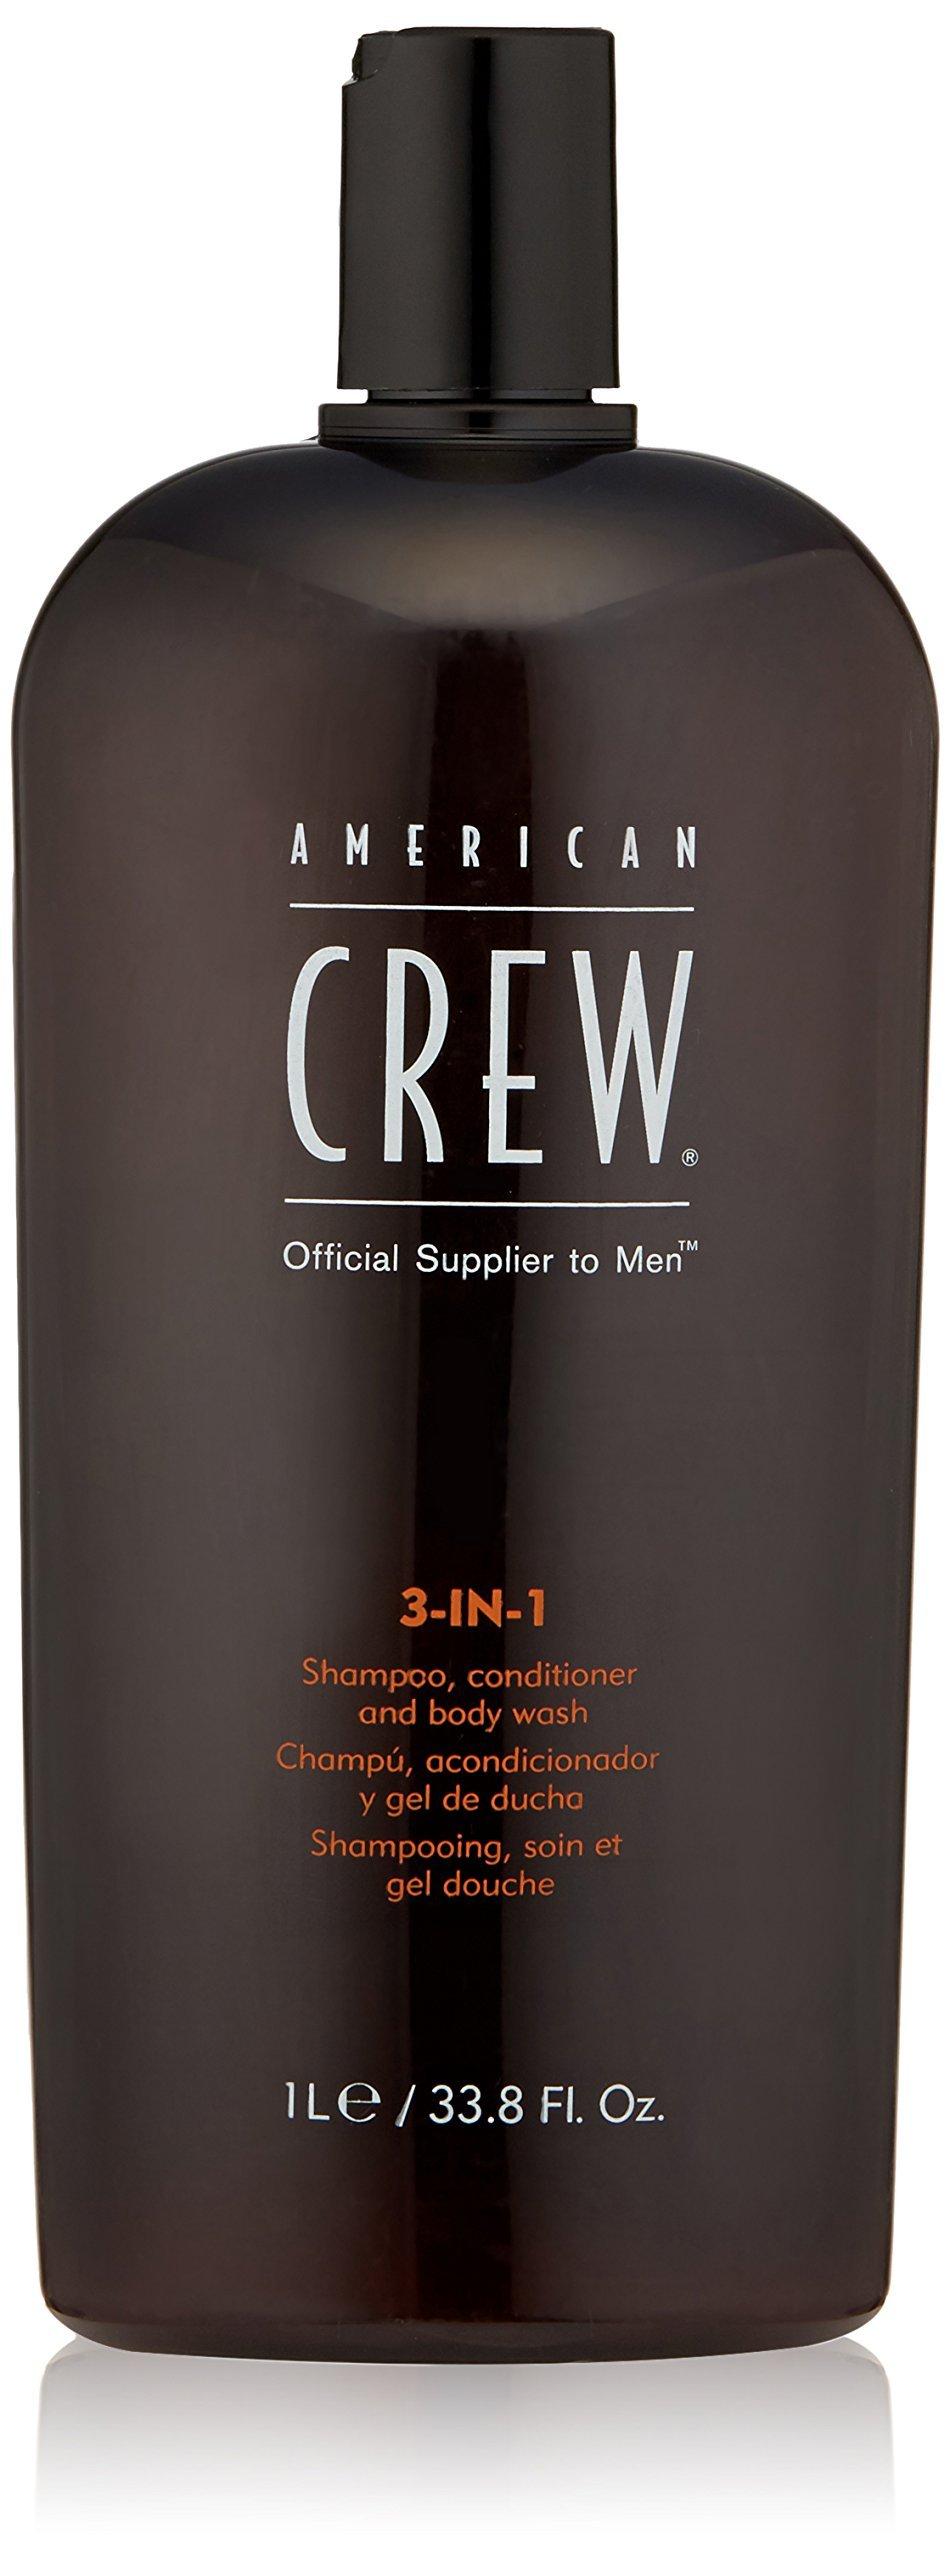 American Crew Classic 3-in-1 Shampoo Plus Conditioner, 33.8 Ounce